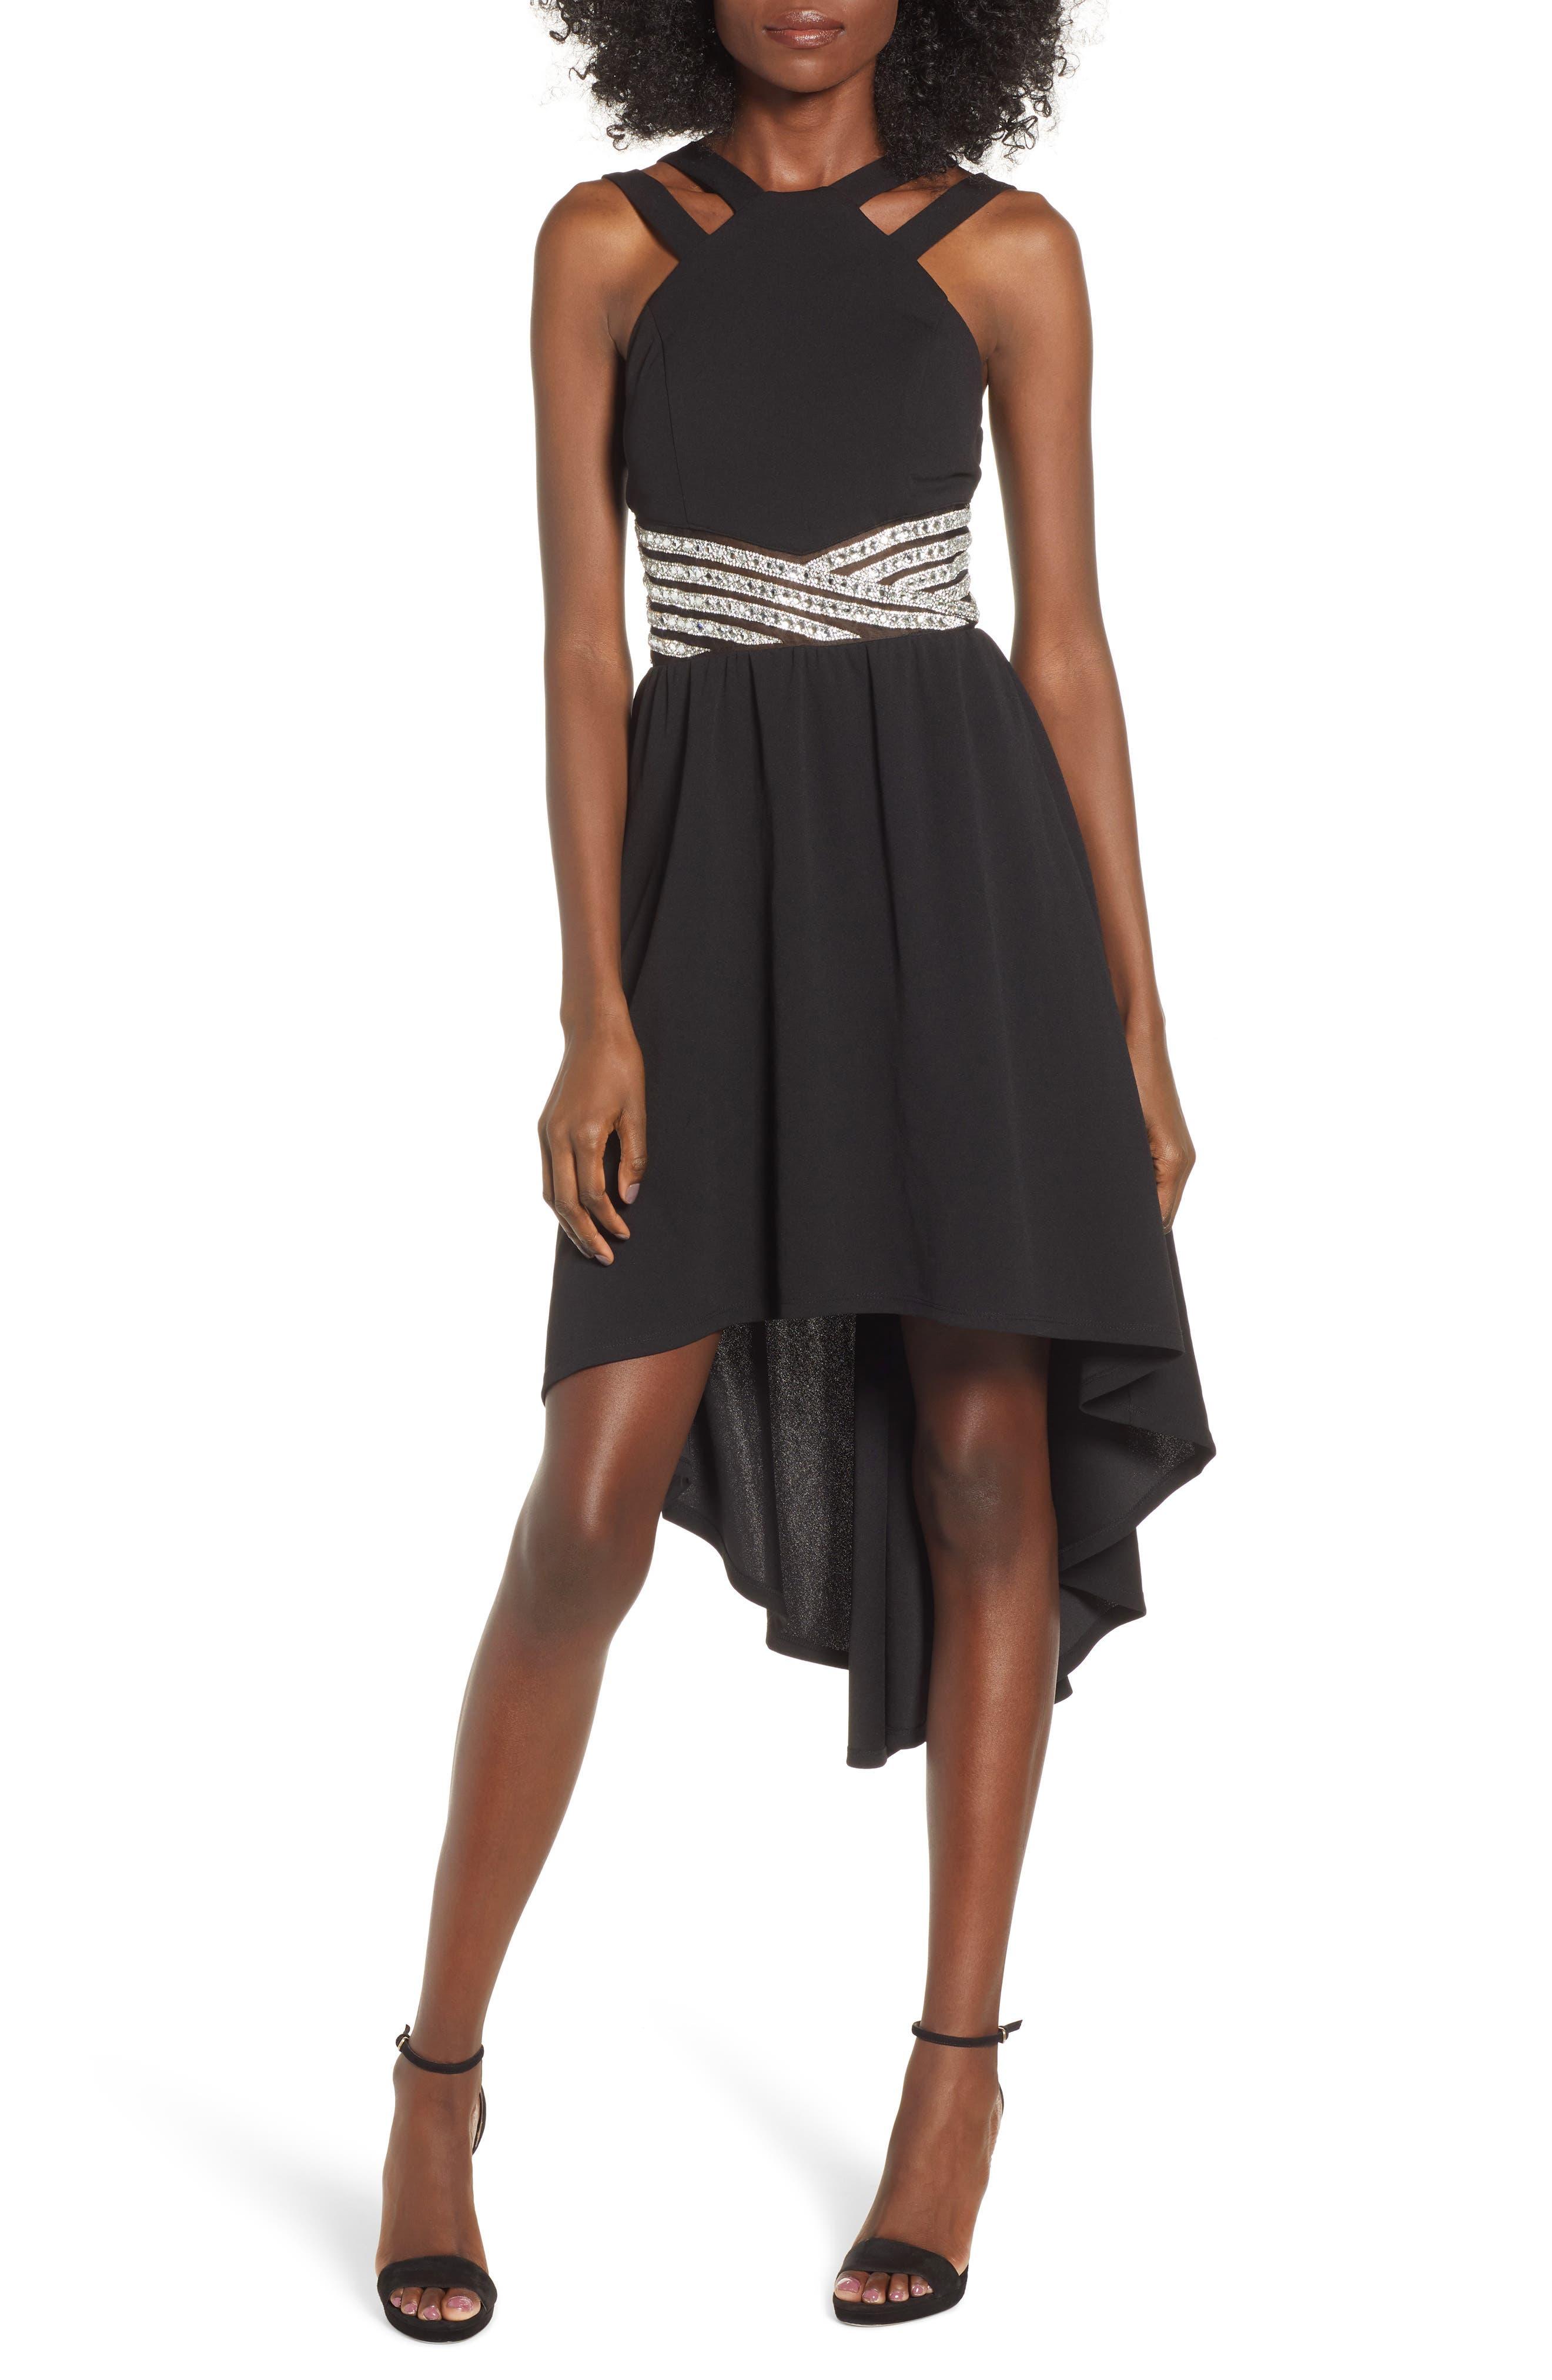 LOVE, NICKIE LEW High/Low Jeweled Waist Dress, Main, color, 001